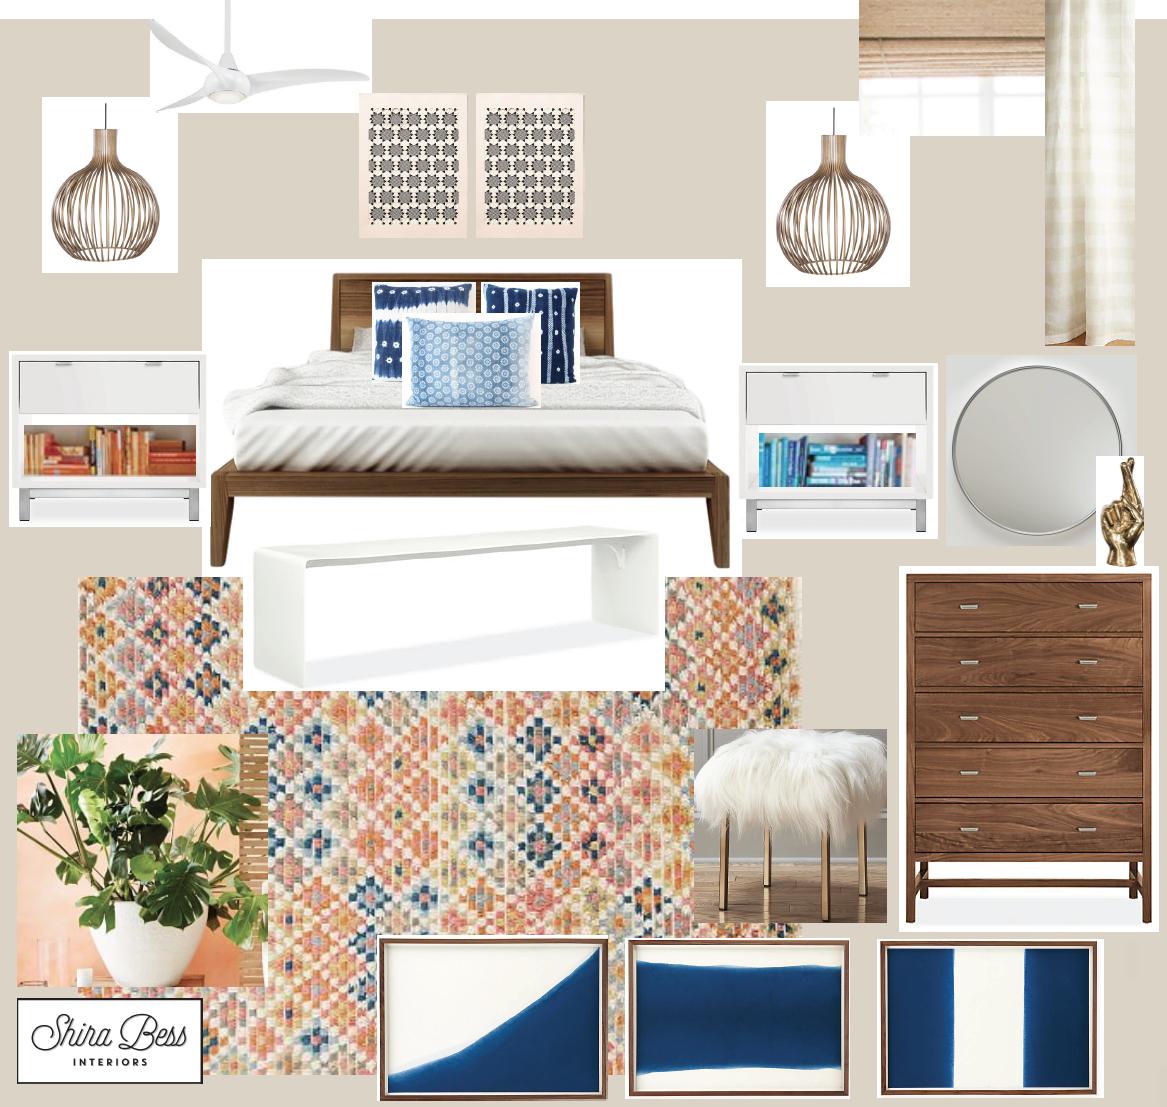 Naples Master Bedroom - Option 1